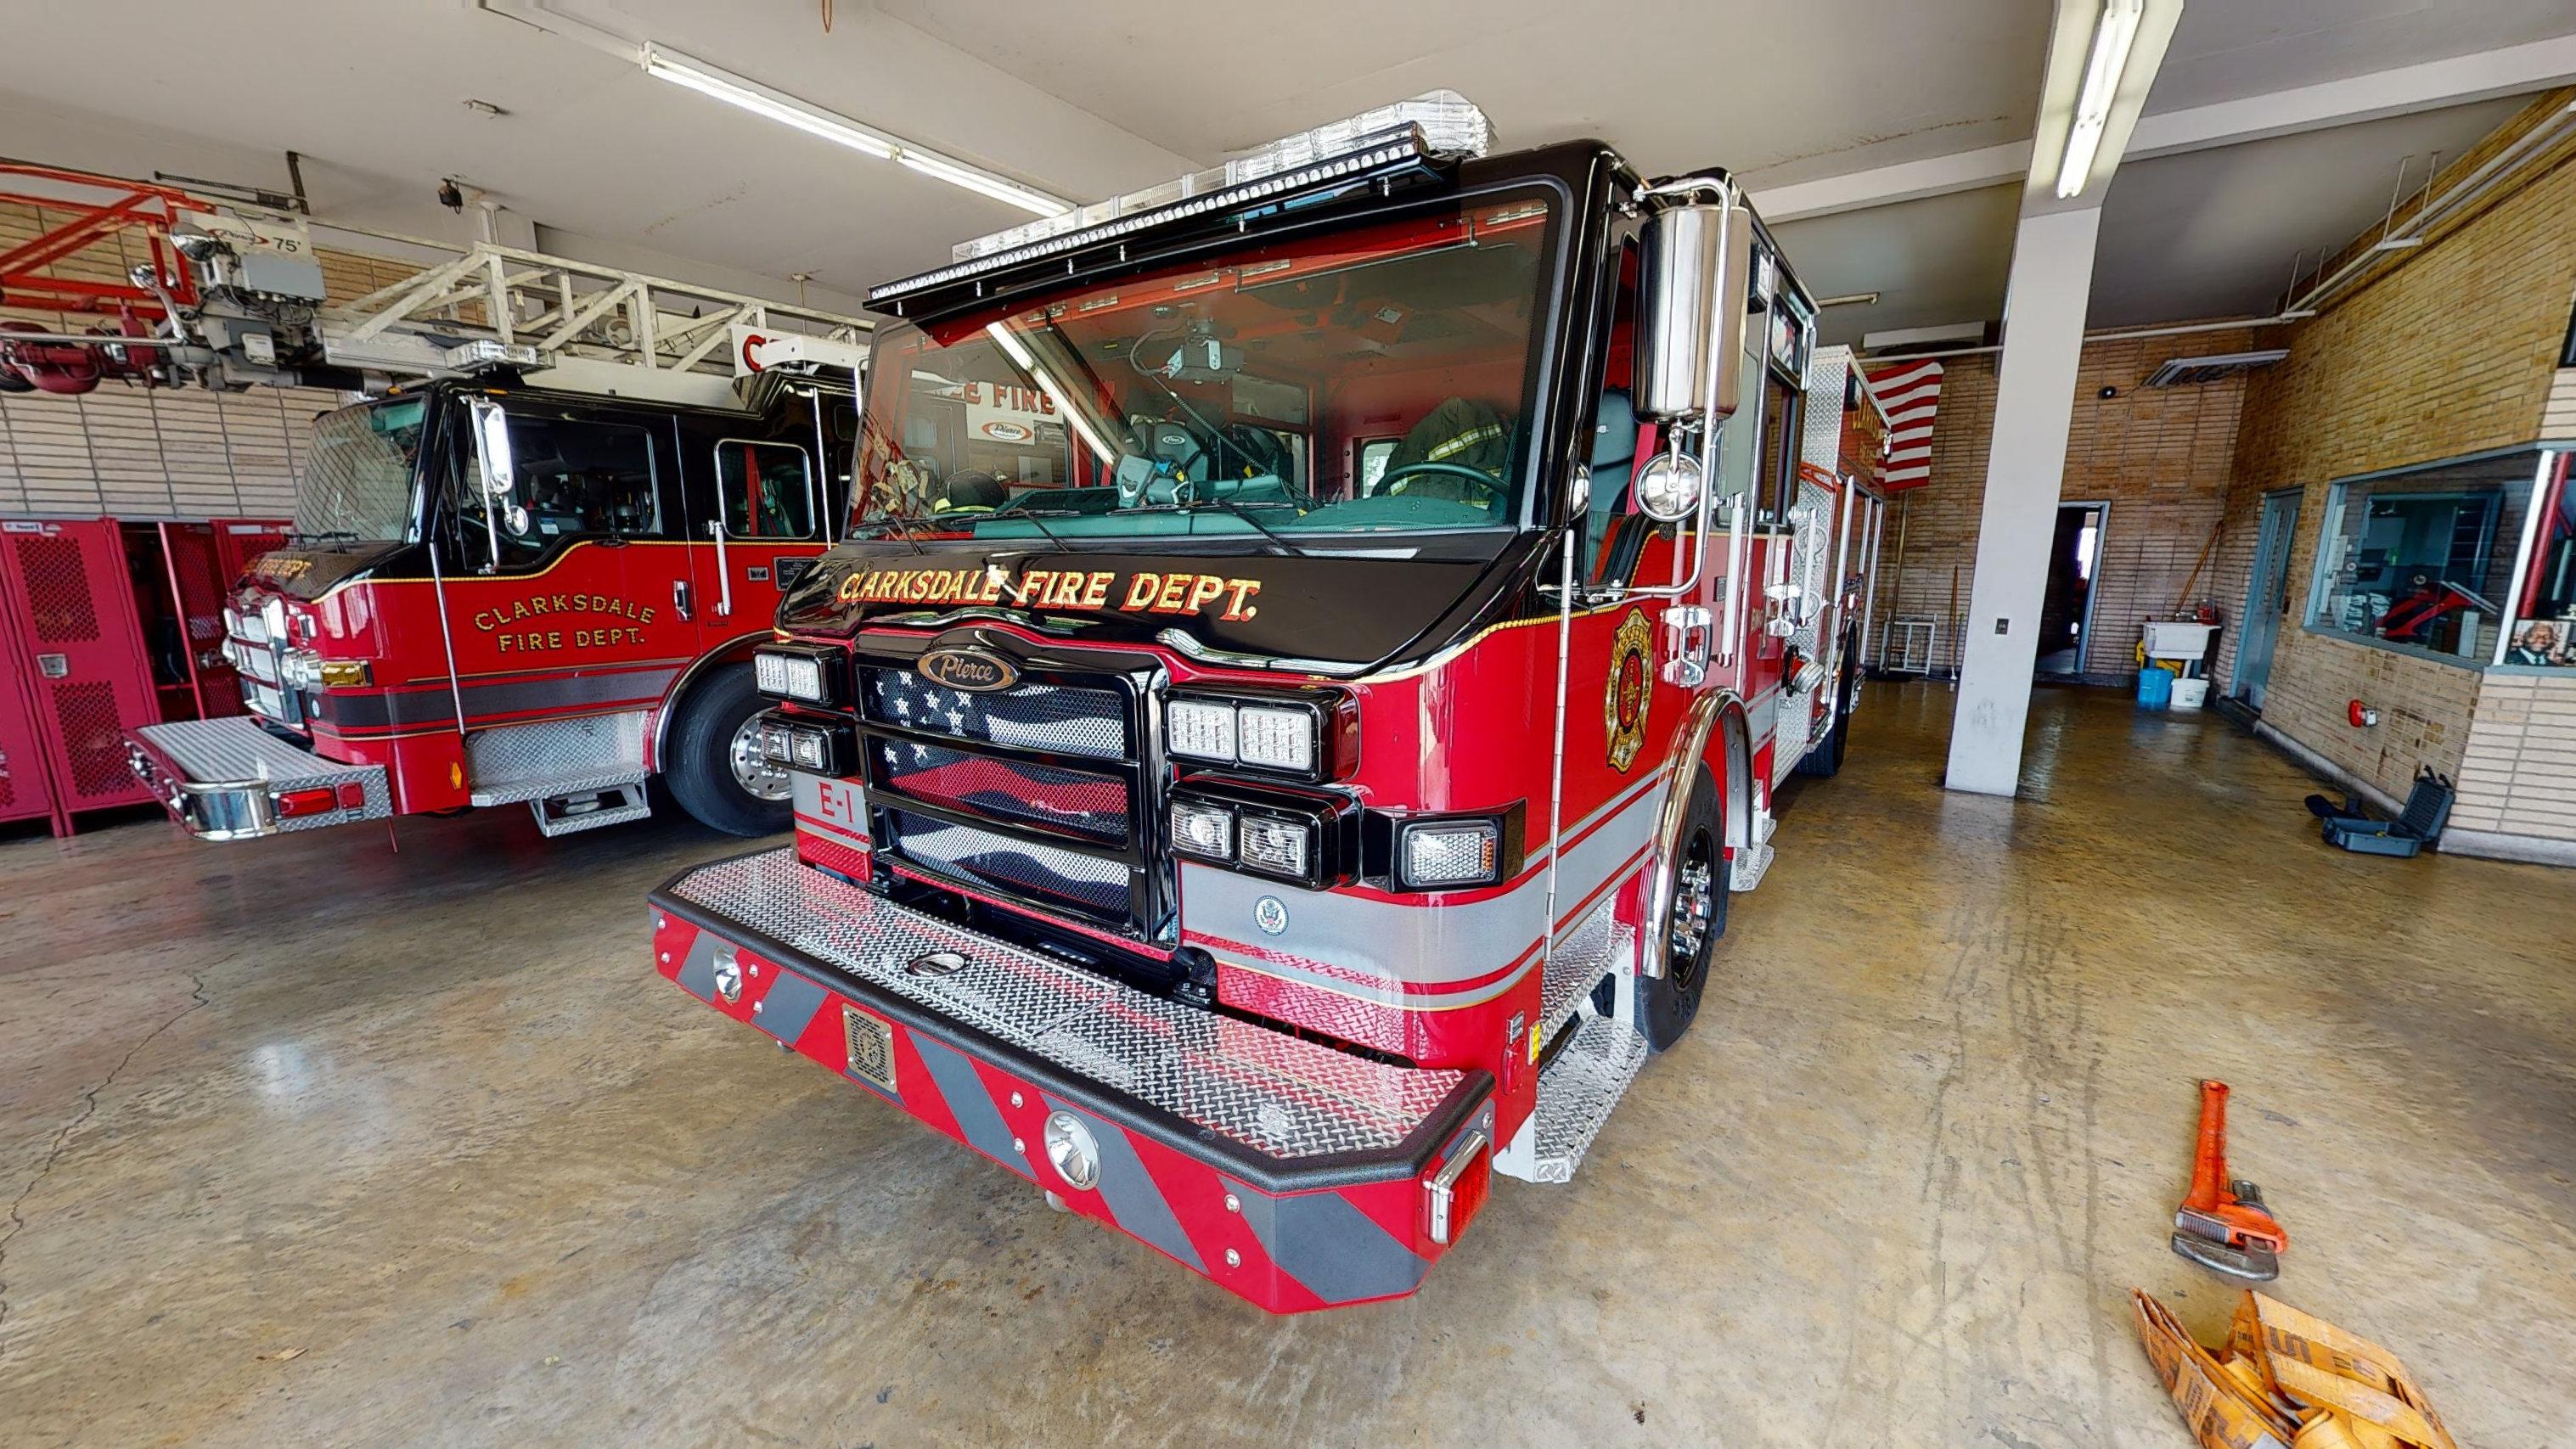 5_Clarksdale-Fire-Dept-06072021_112119